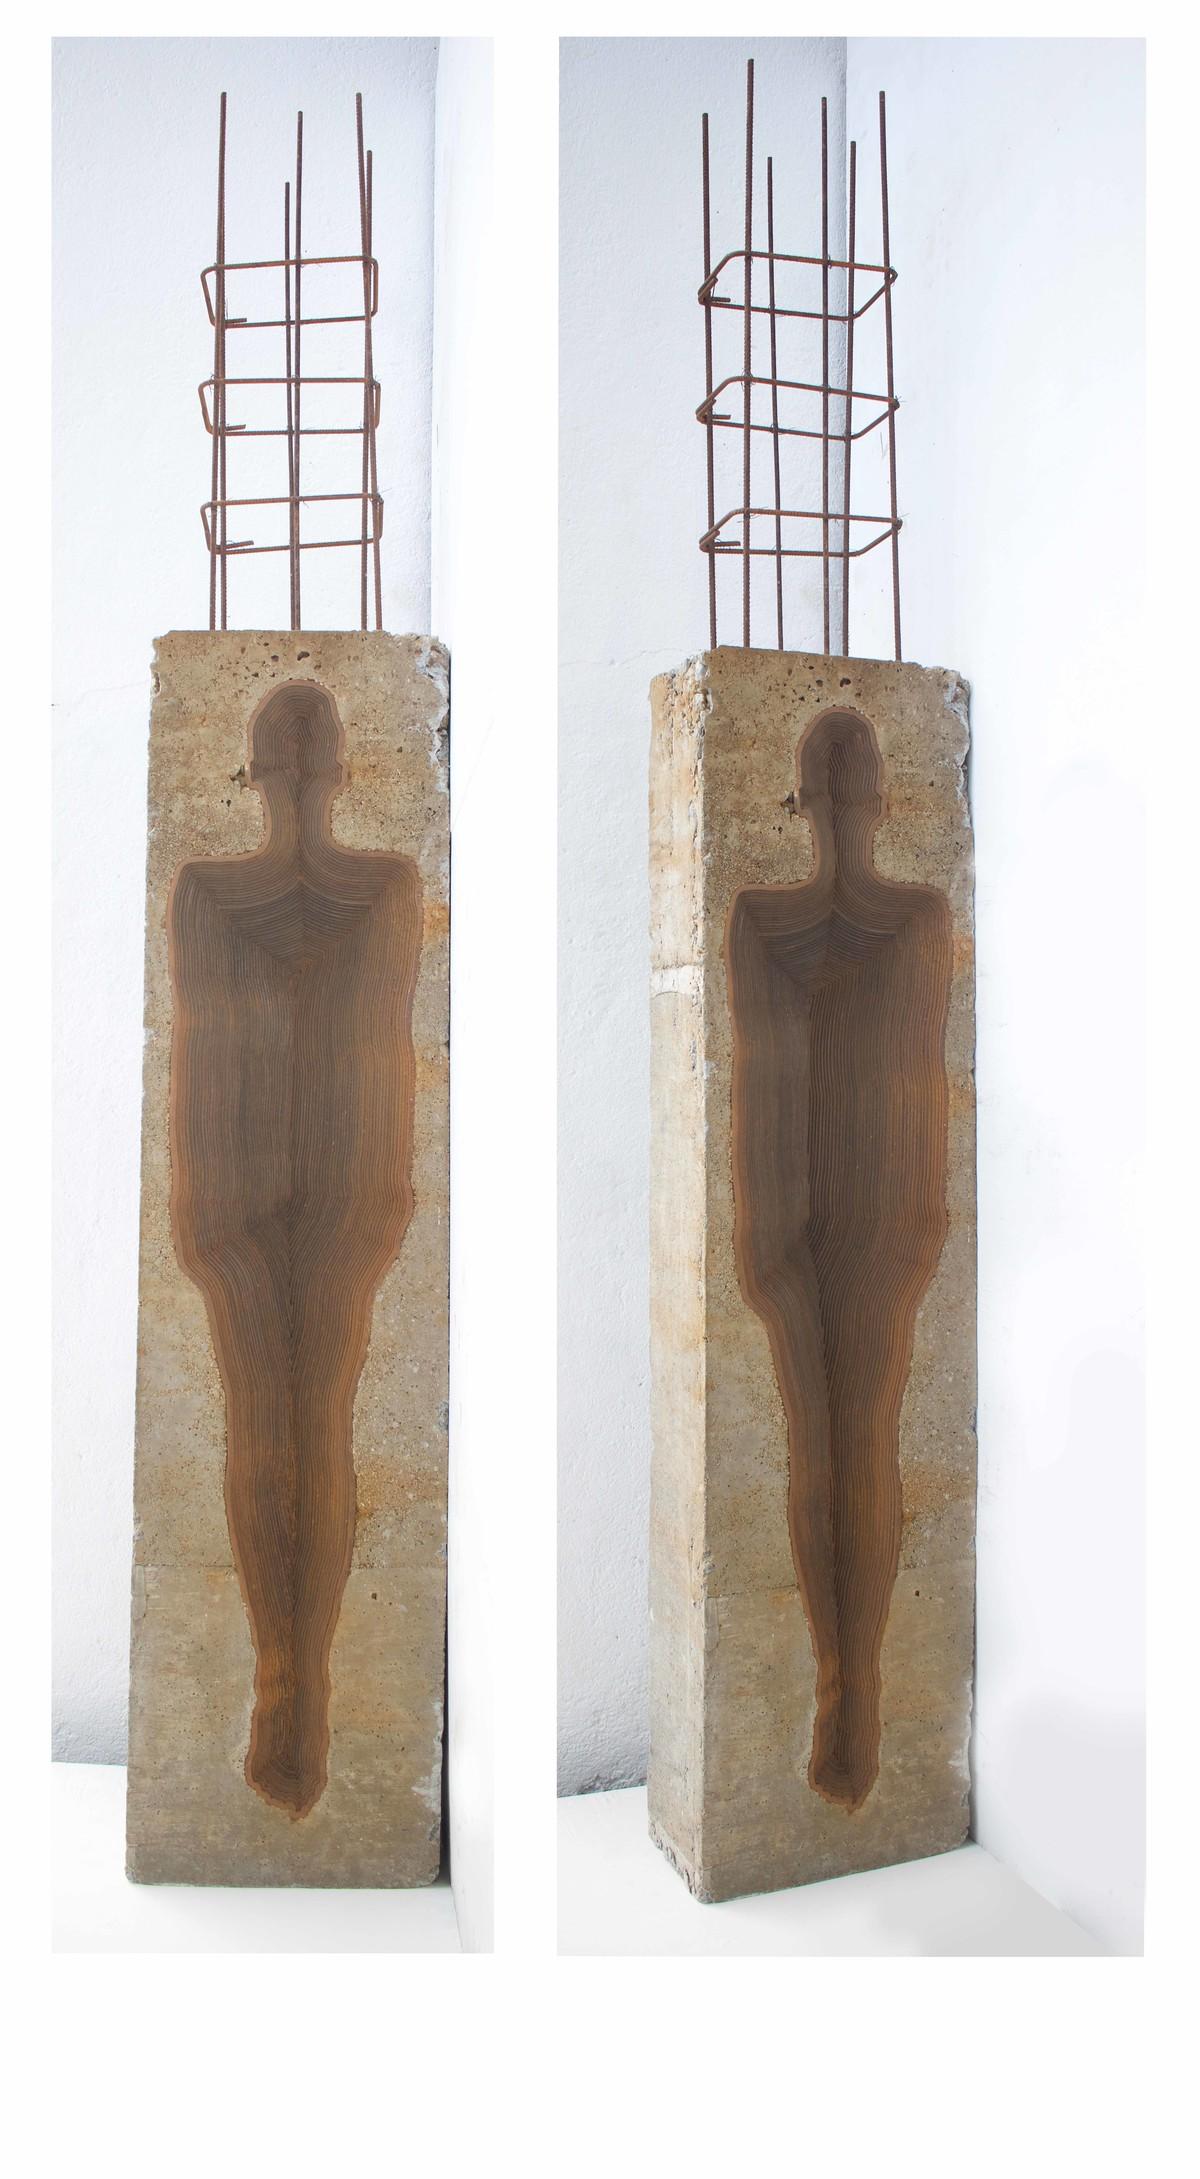 Construction by Janarthanan R, Art Deco Sculpture | 3D, Mixed Media,